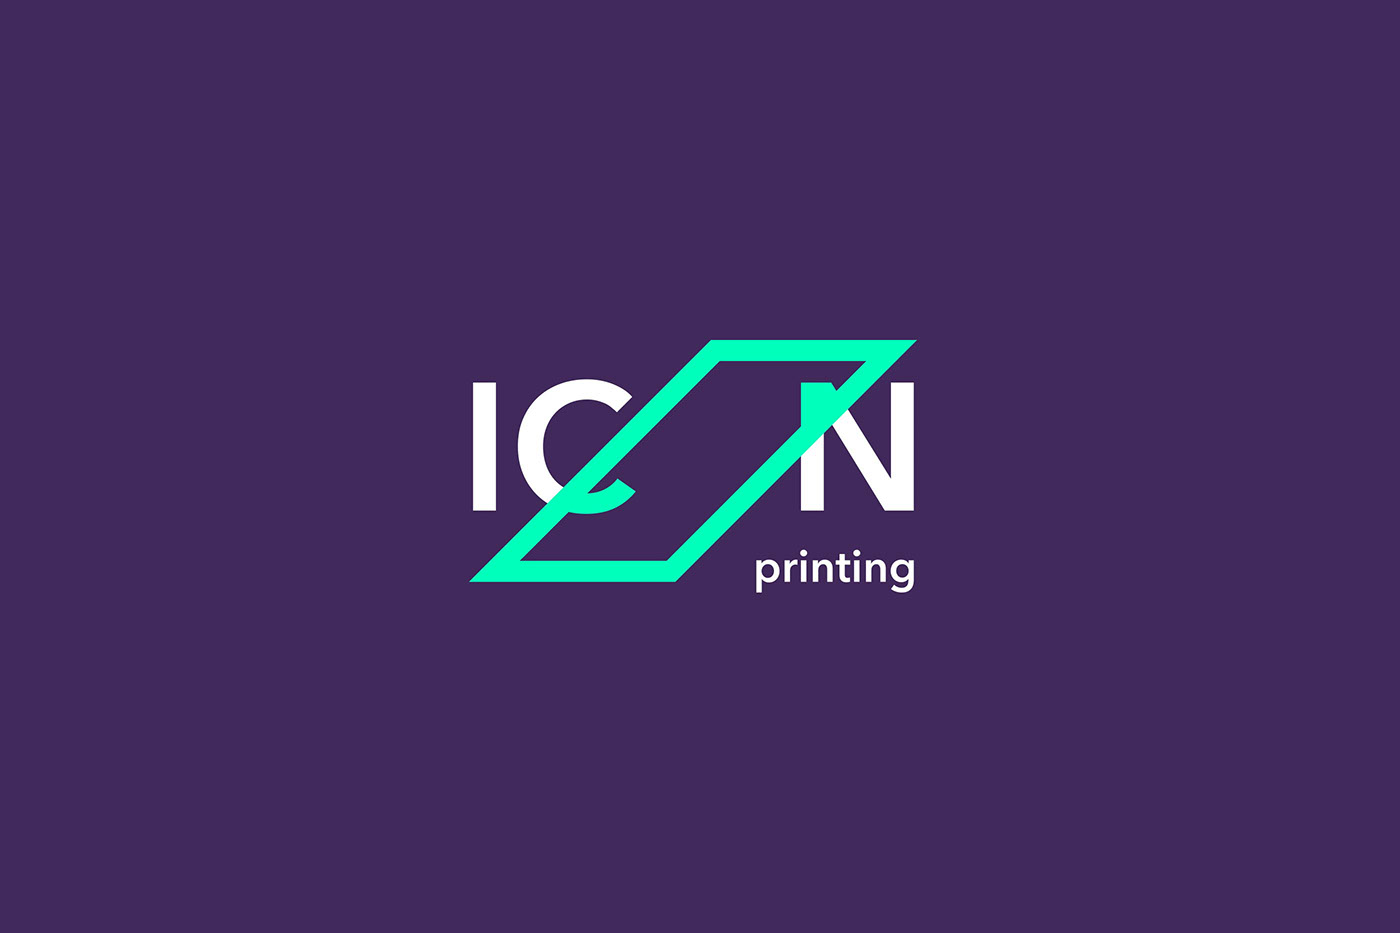 ICON Printing strategic rebrand programme